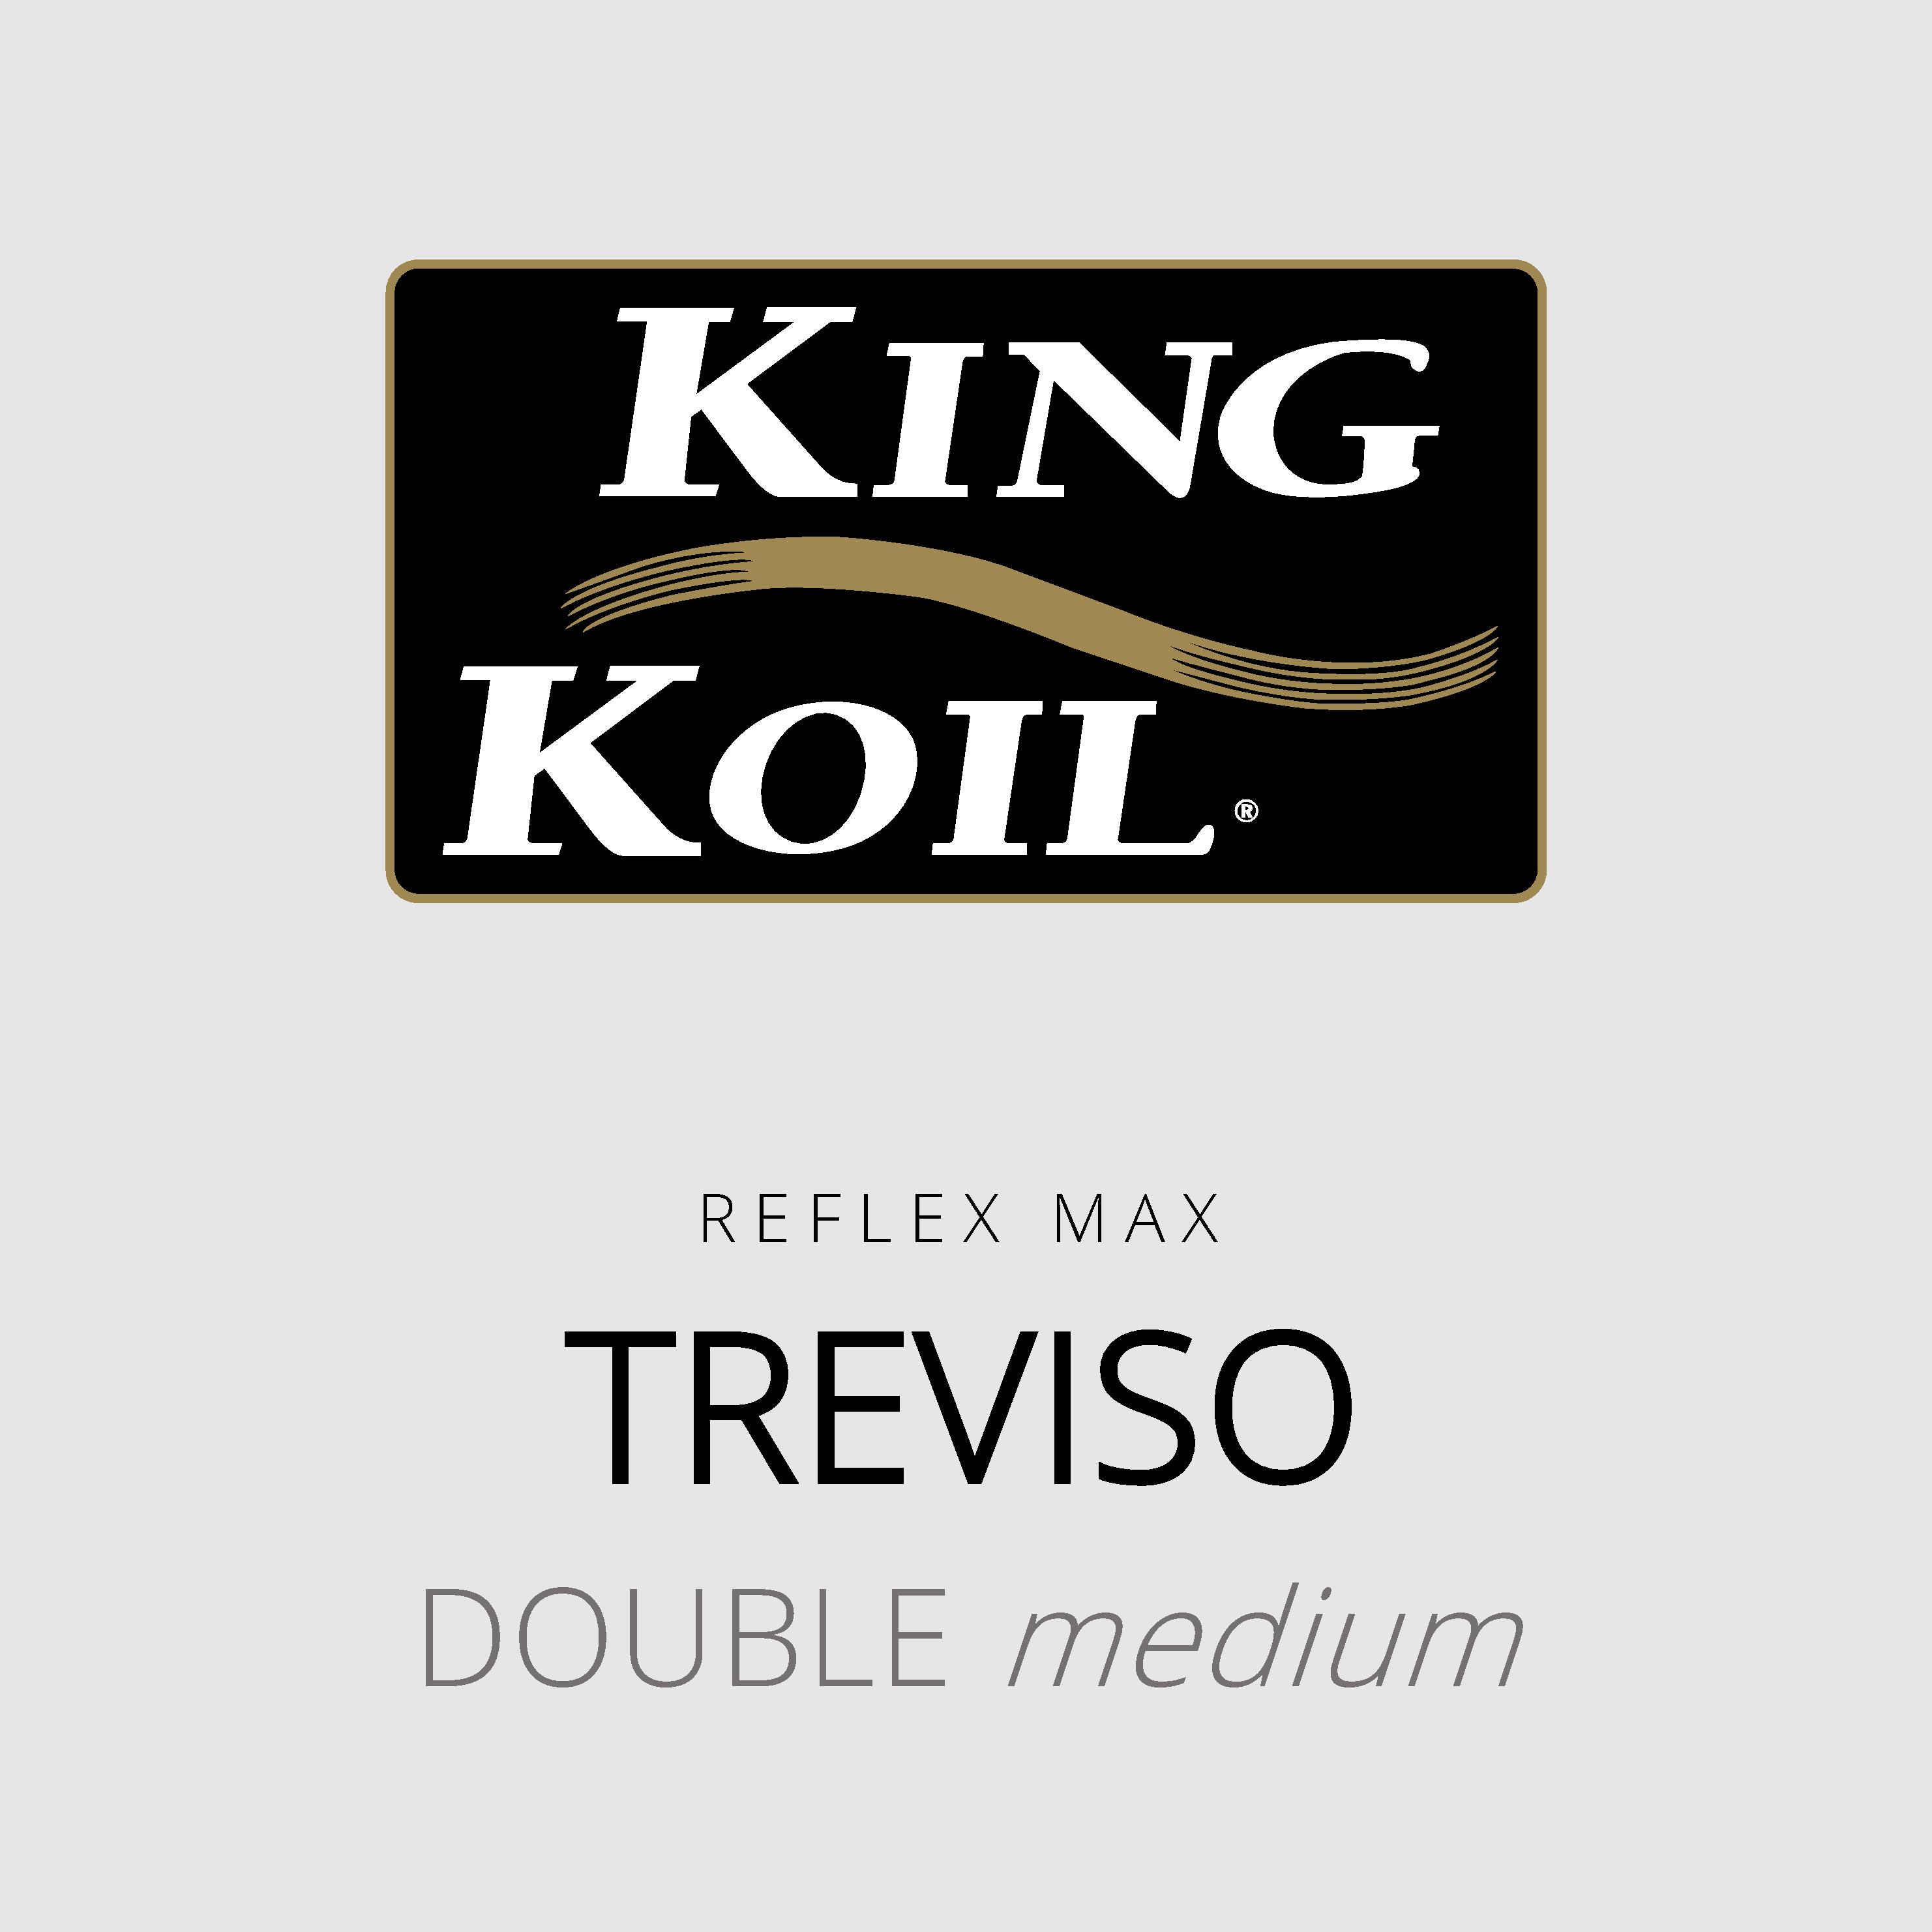 King Koil – Treviso – Reflex Max – Double Medium Mattress